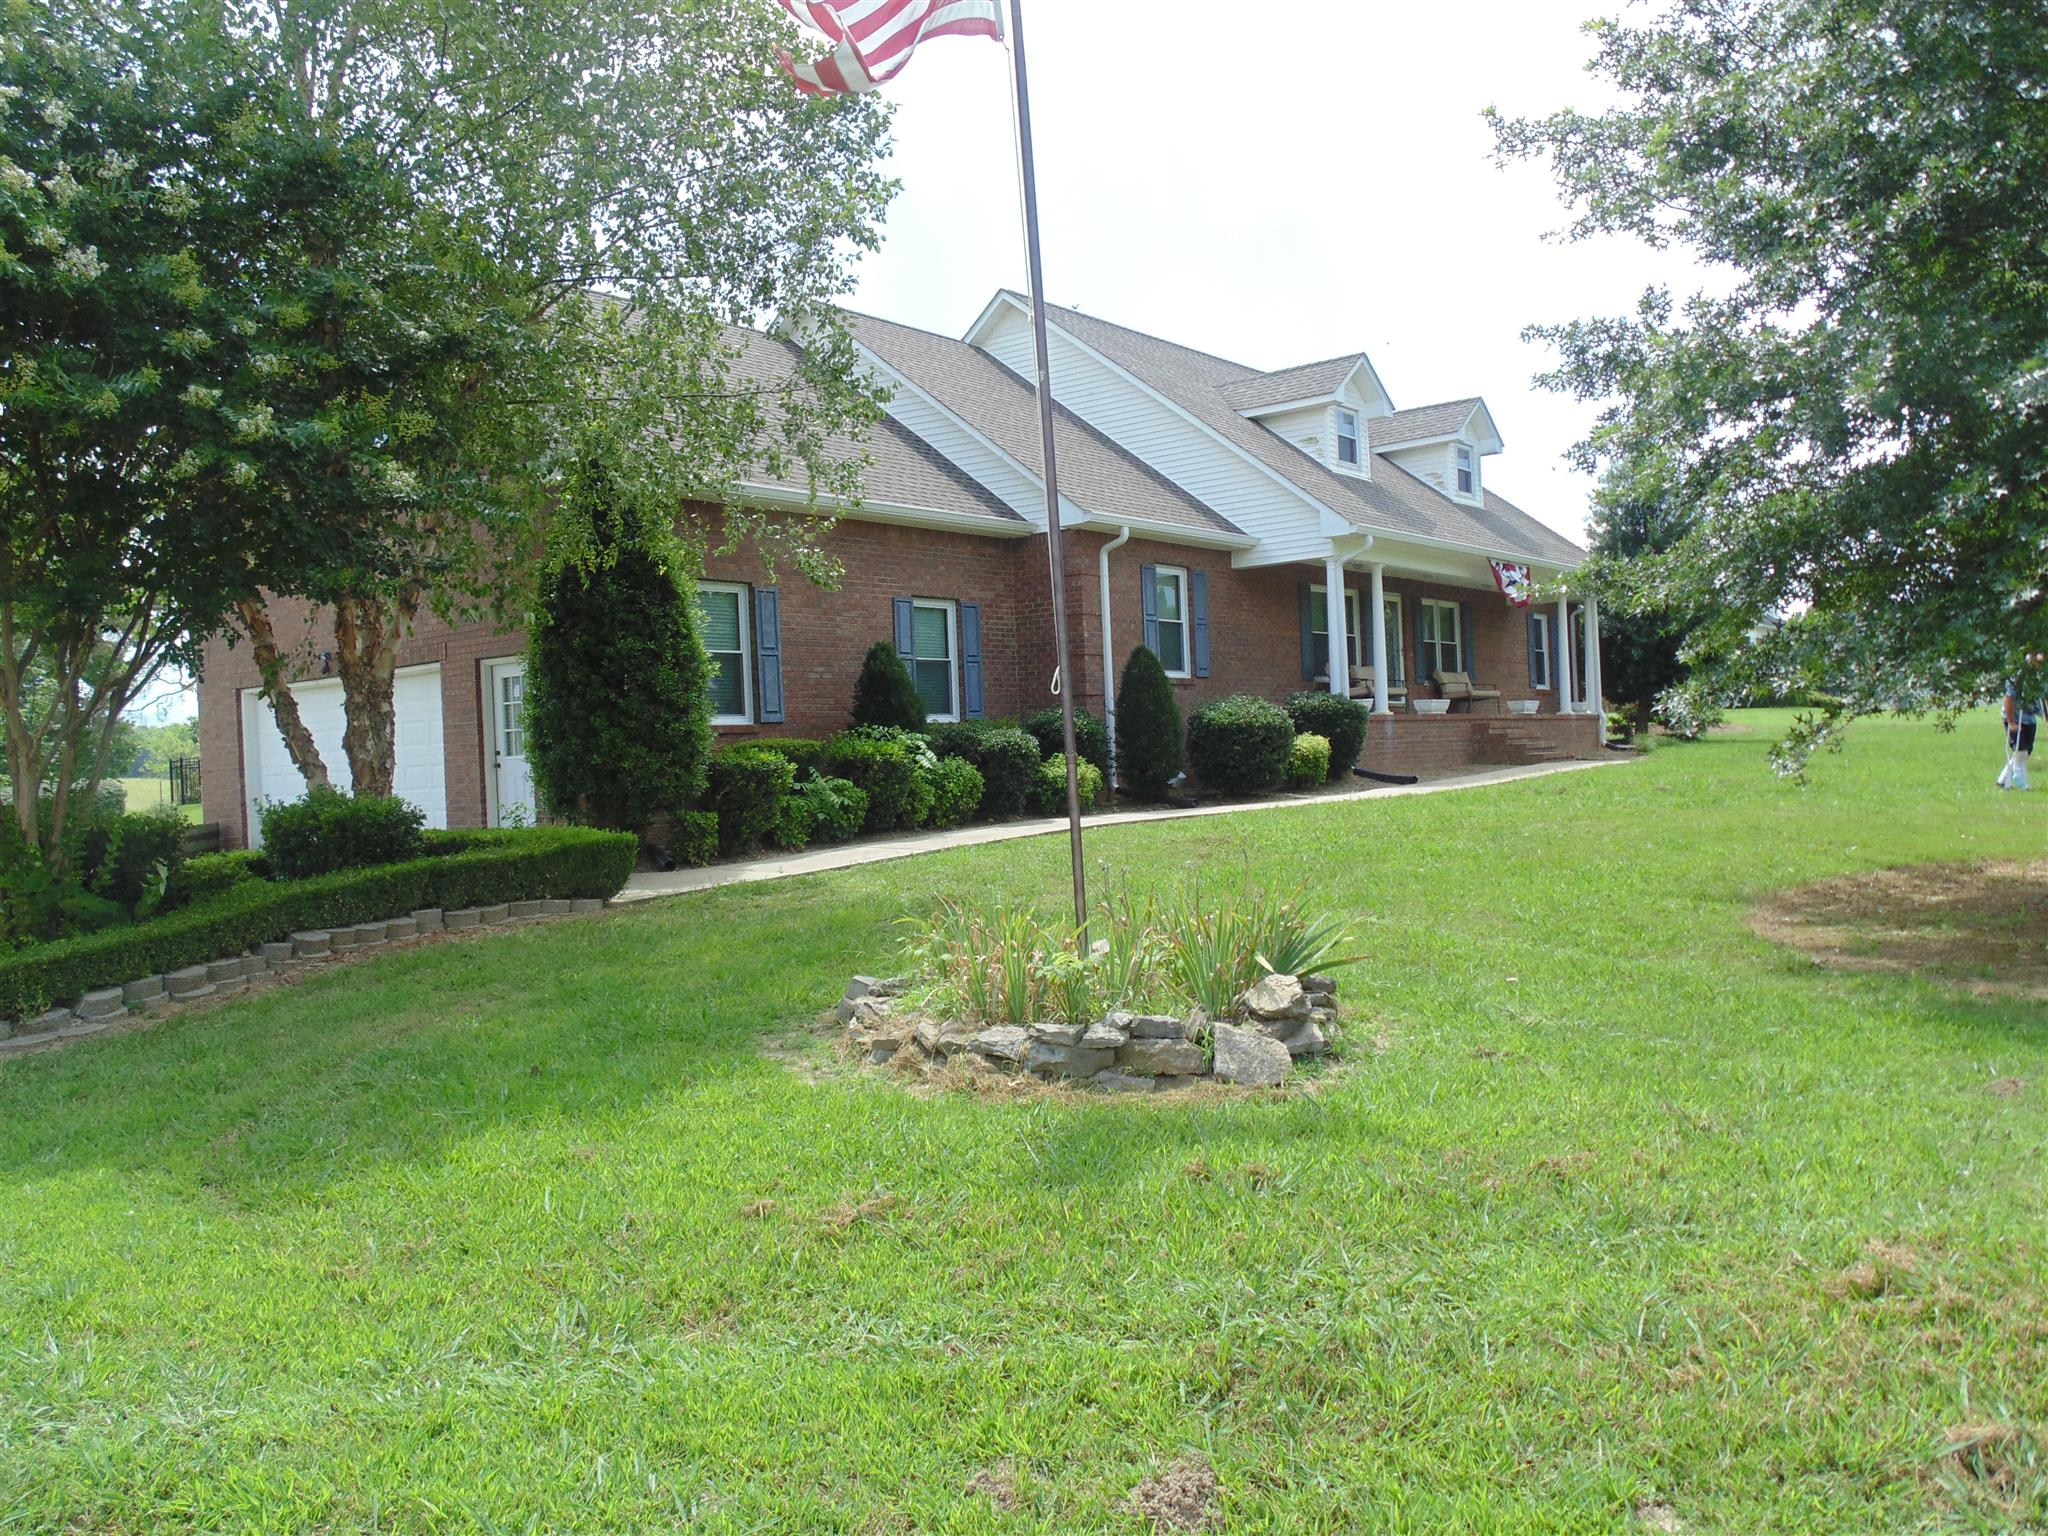 584 Jennings Ln, Shelbyville, TN 37160